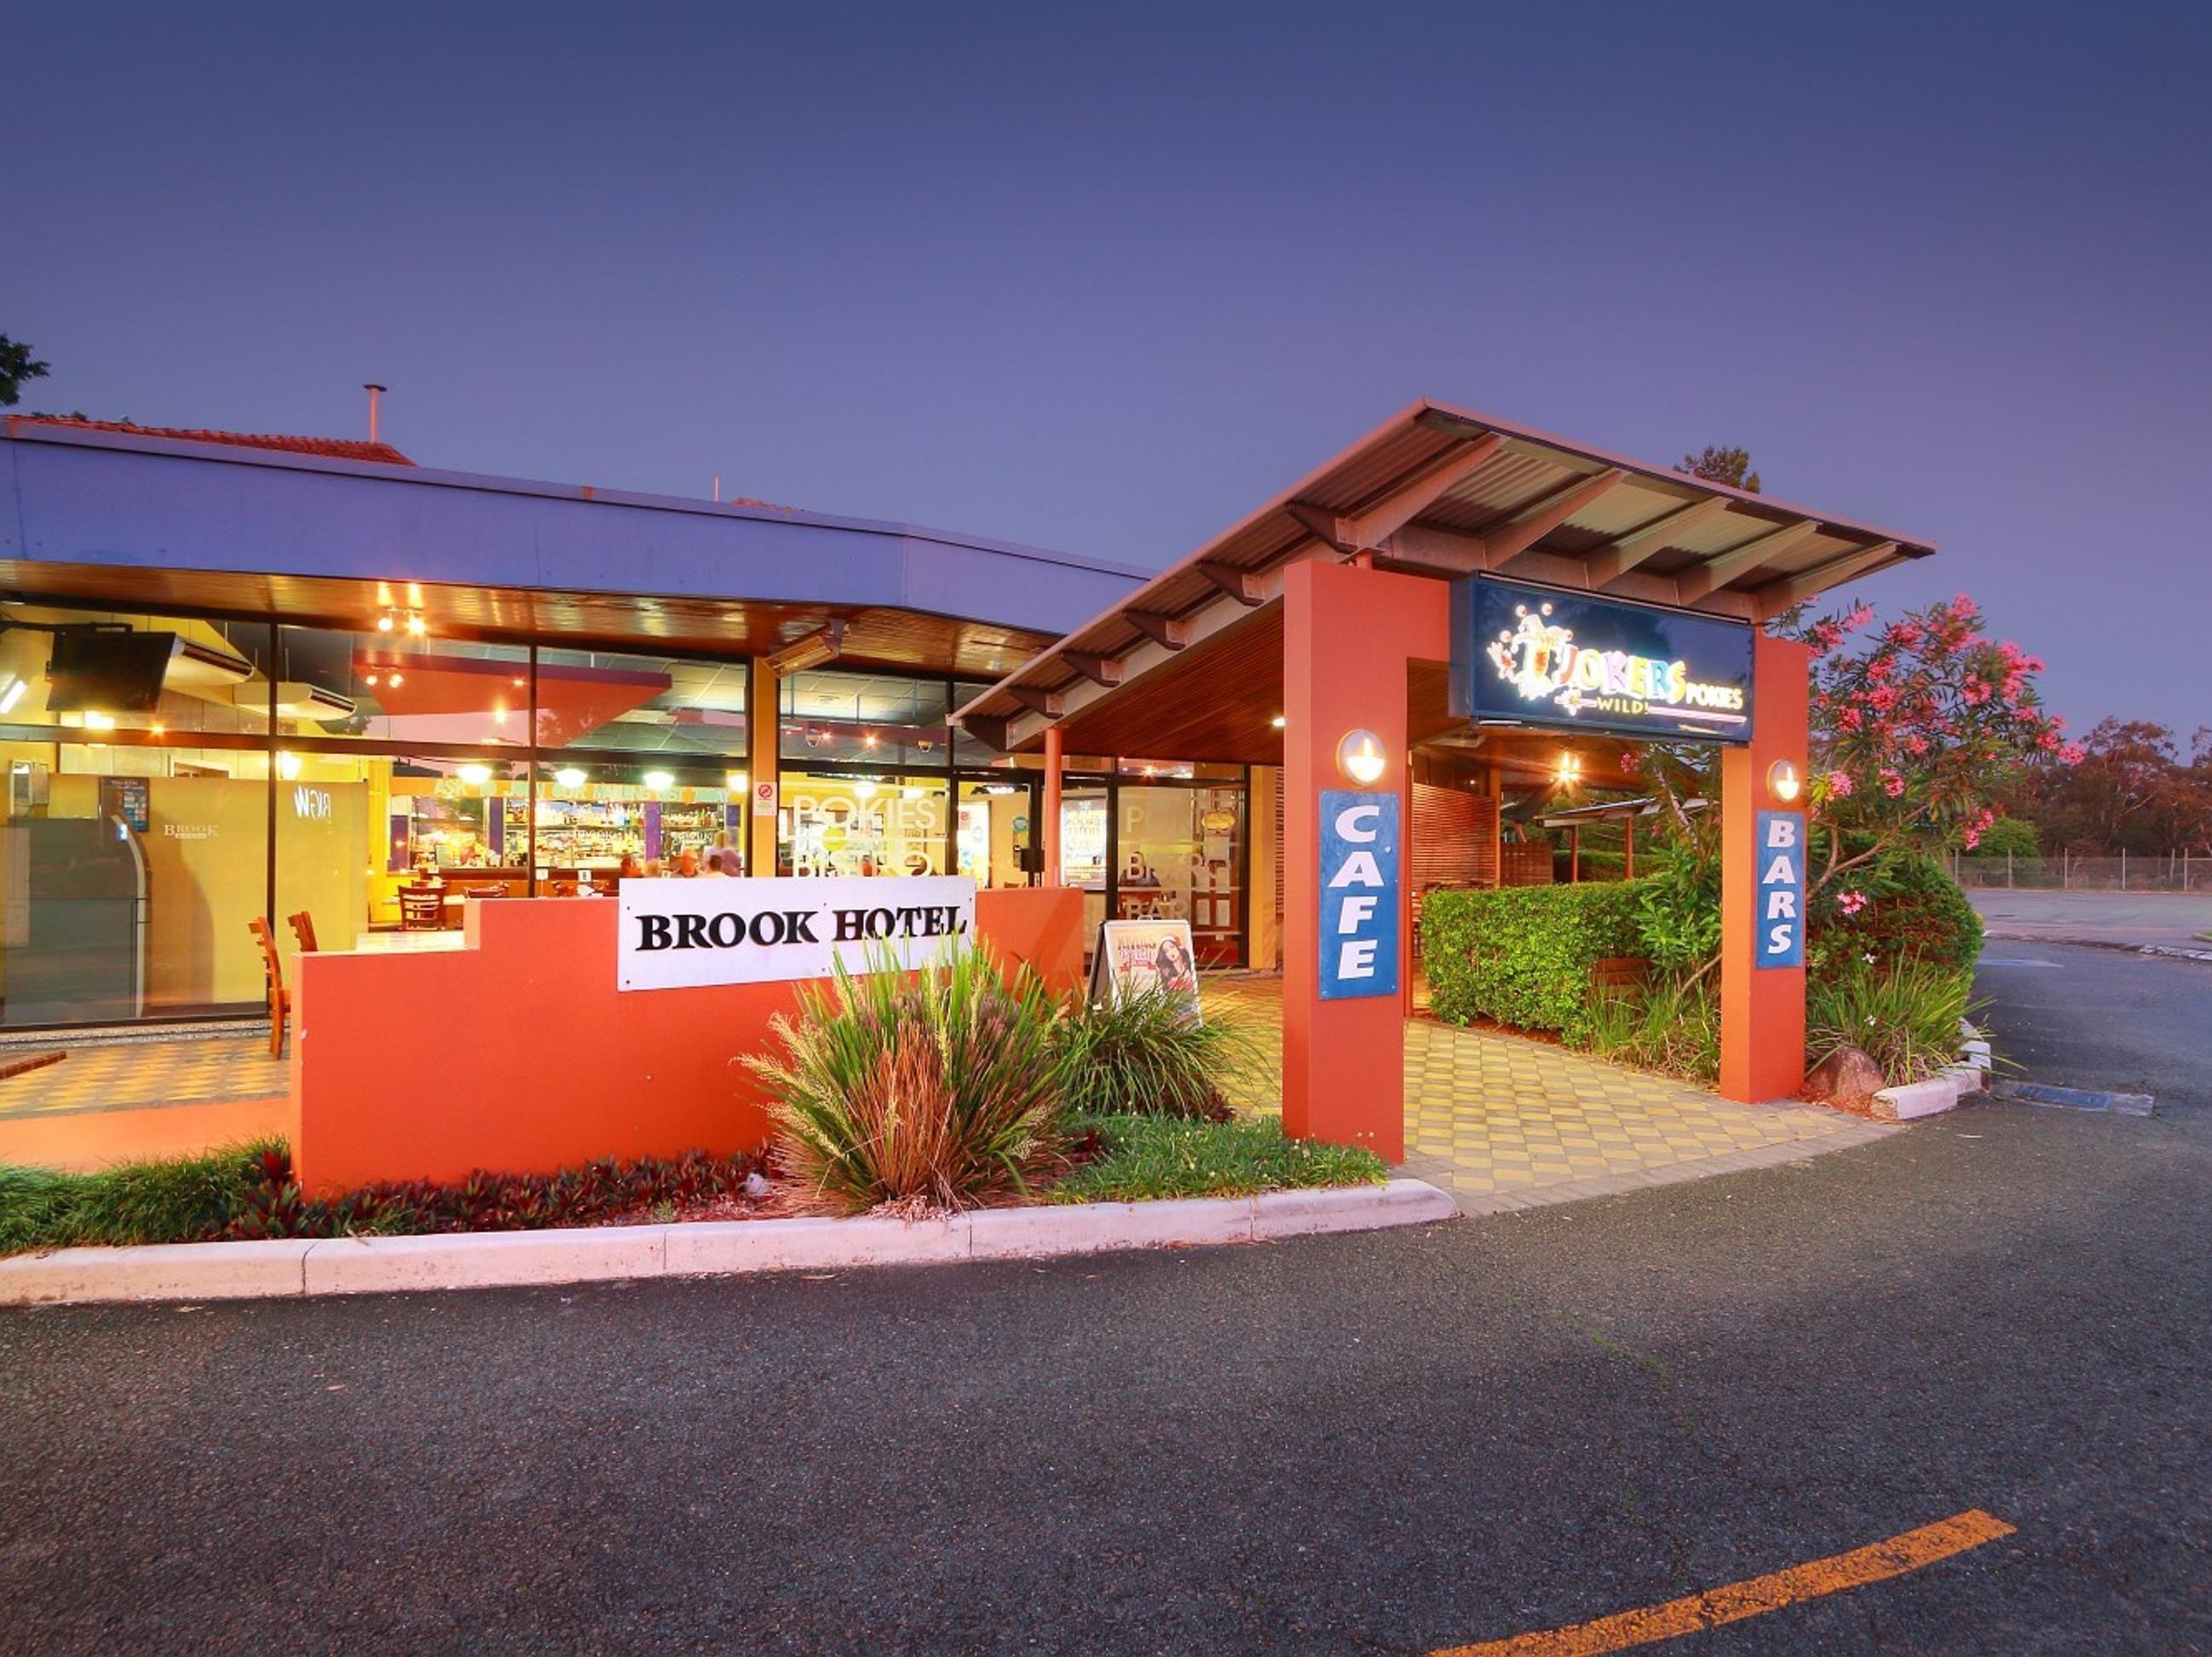 Brisbane brook hotel australia pacific ocean and